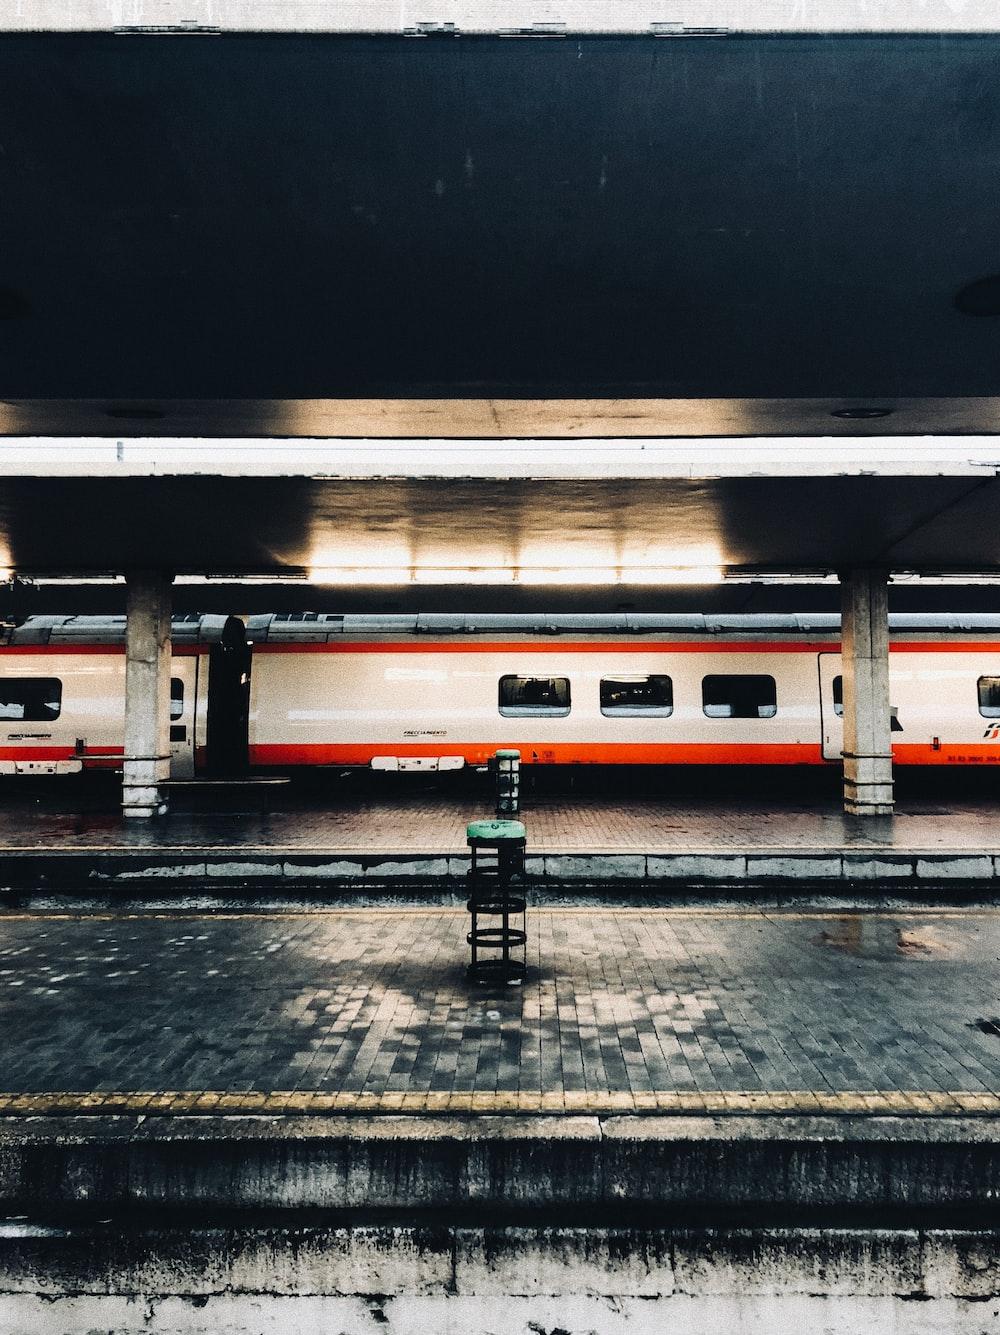 white and orange train